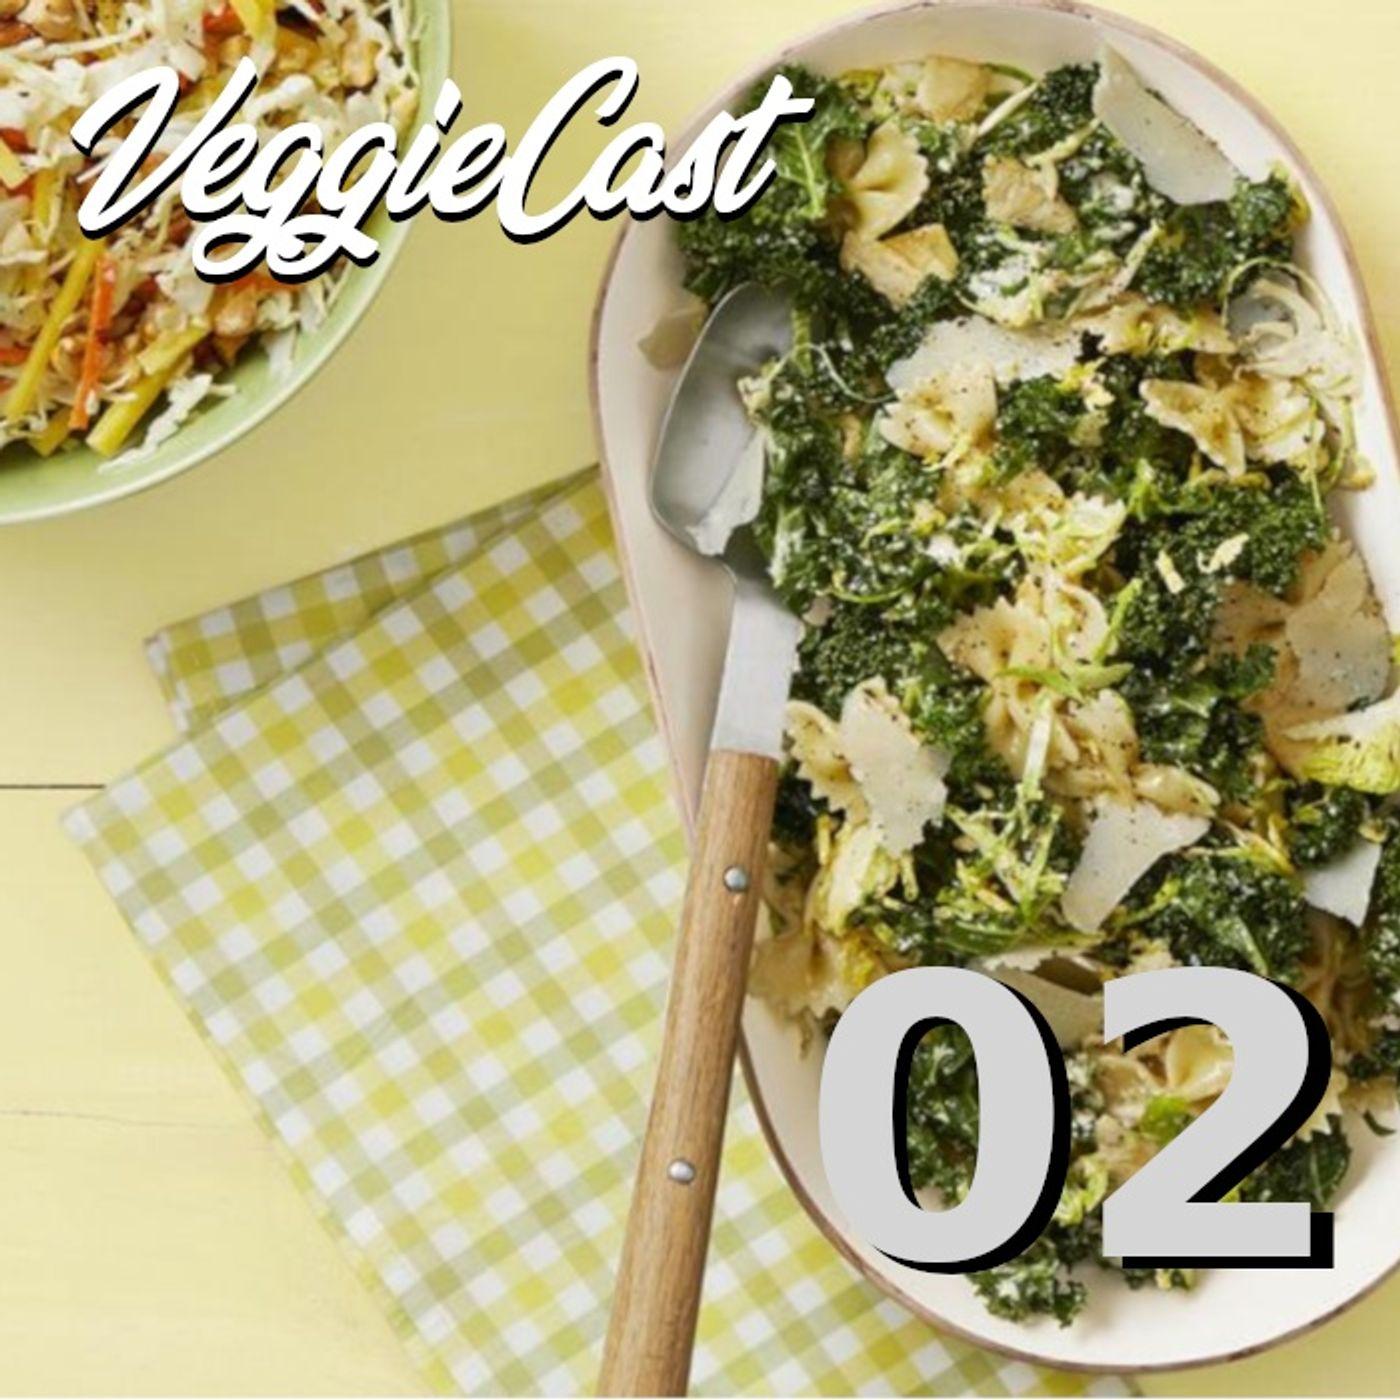 Episódio 02 - Como Nos Tornamos Vegetarianos